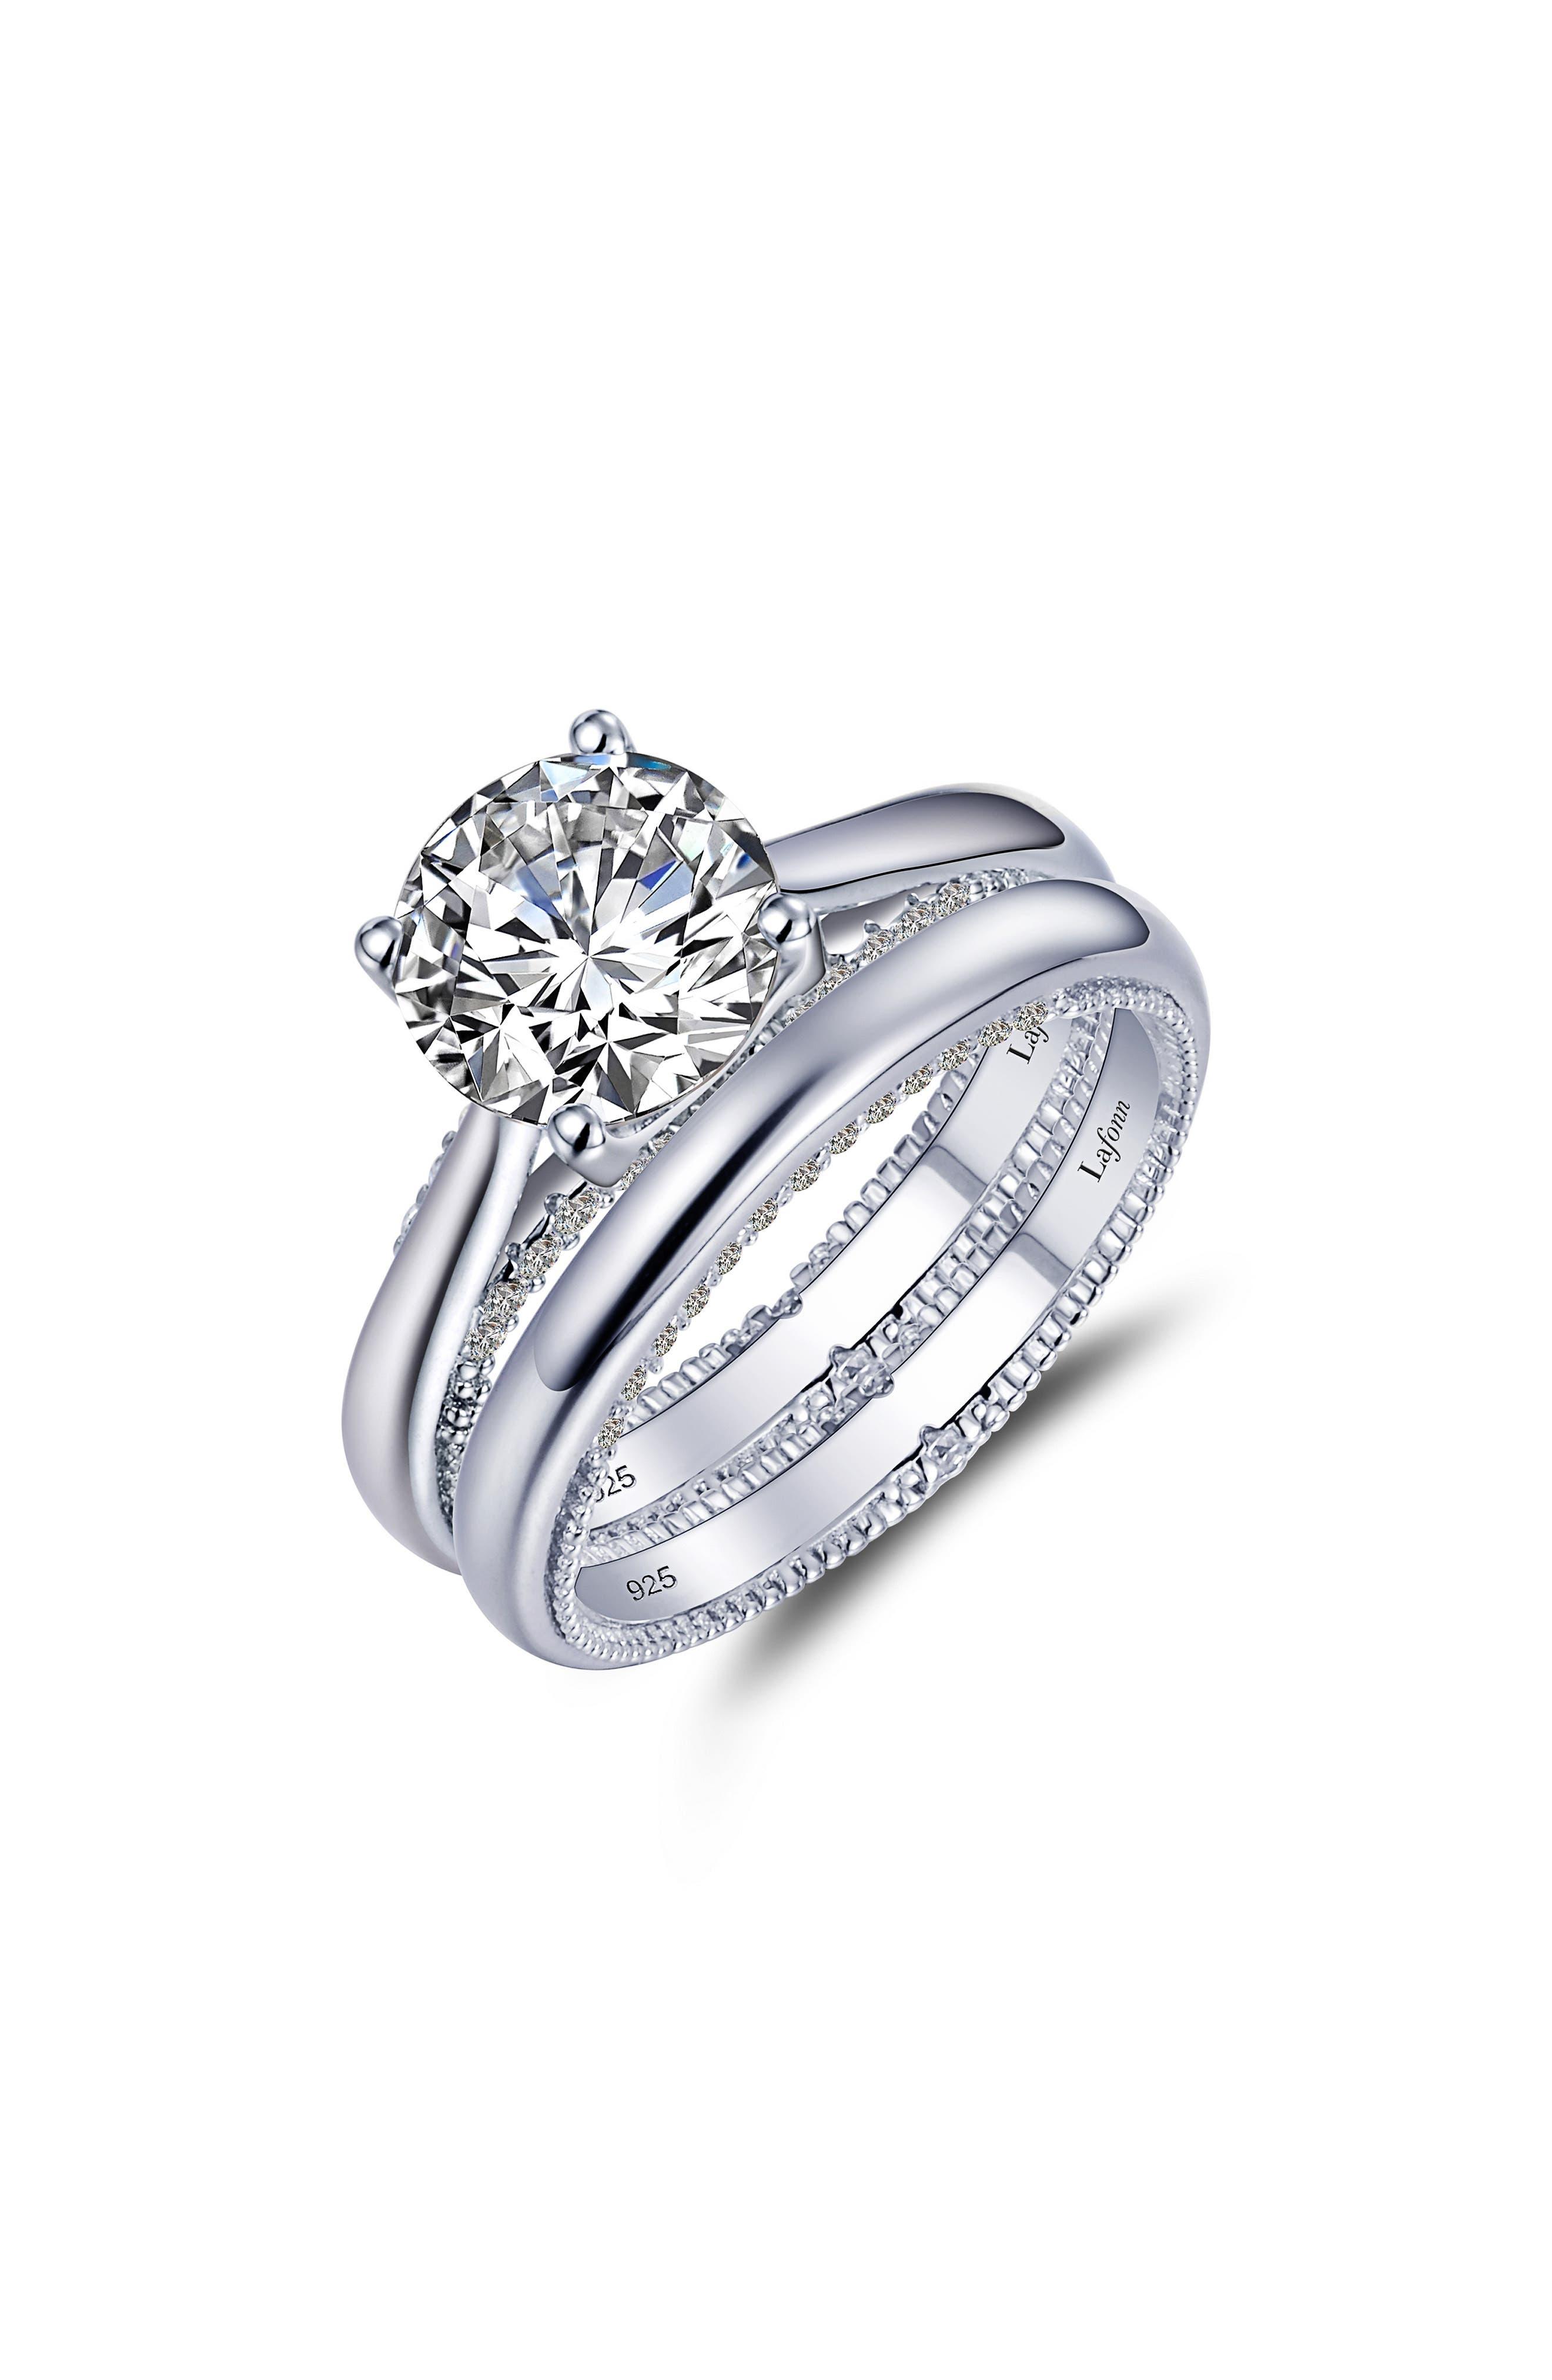 Solitaire Simulated Diamond Wedding Ring Set